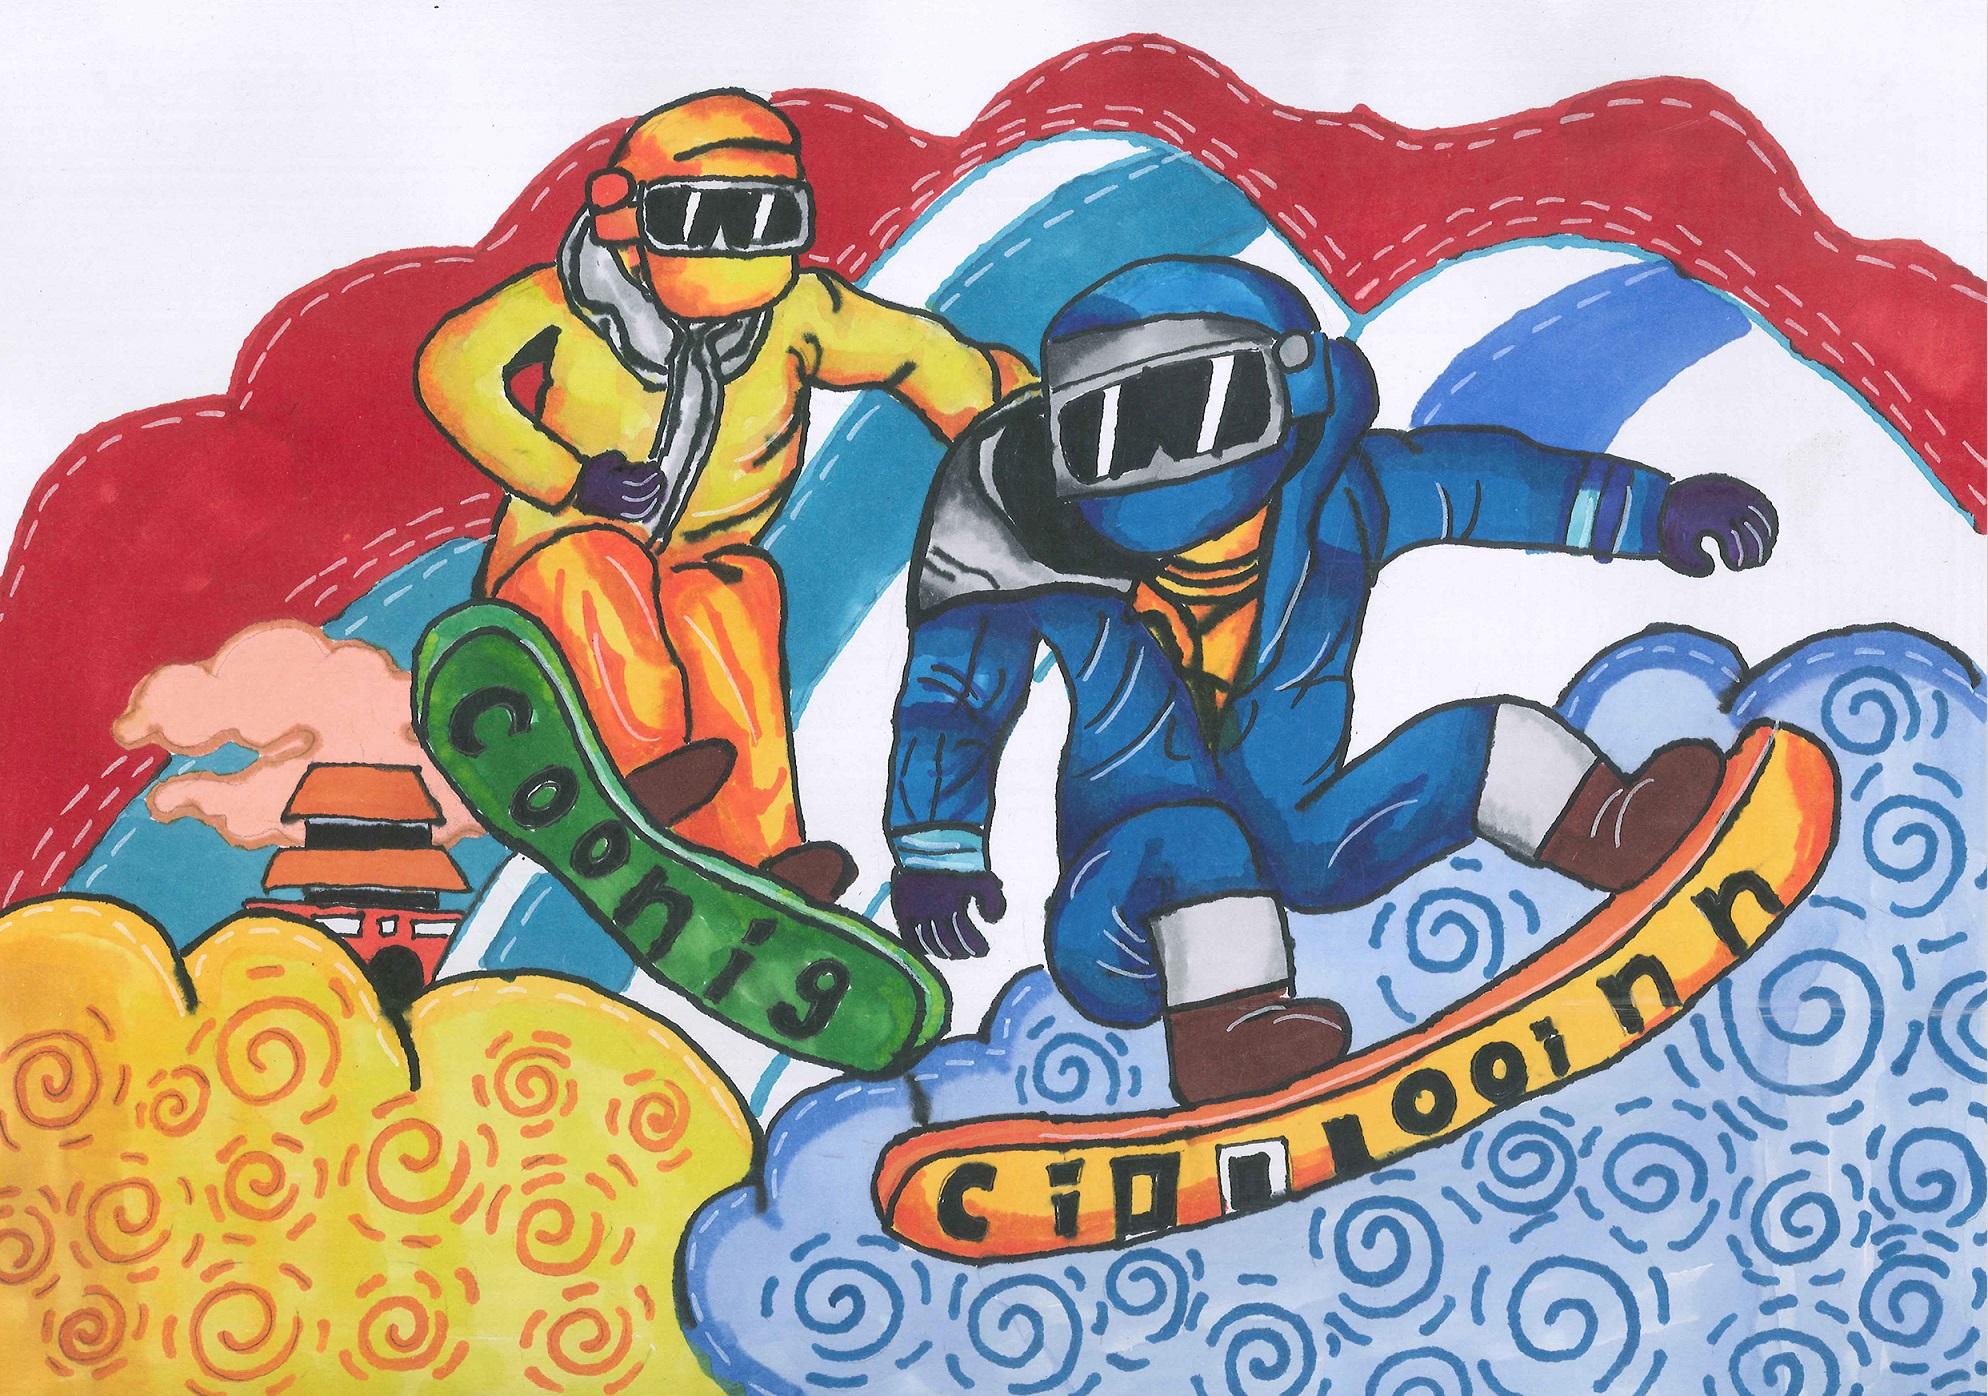 单板绝技 Snowboard Stunt+刘翰林 Liu Hanlin